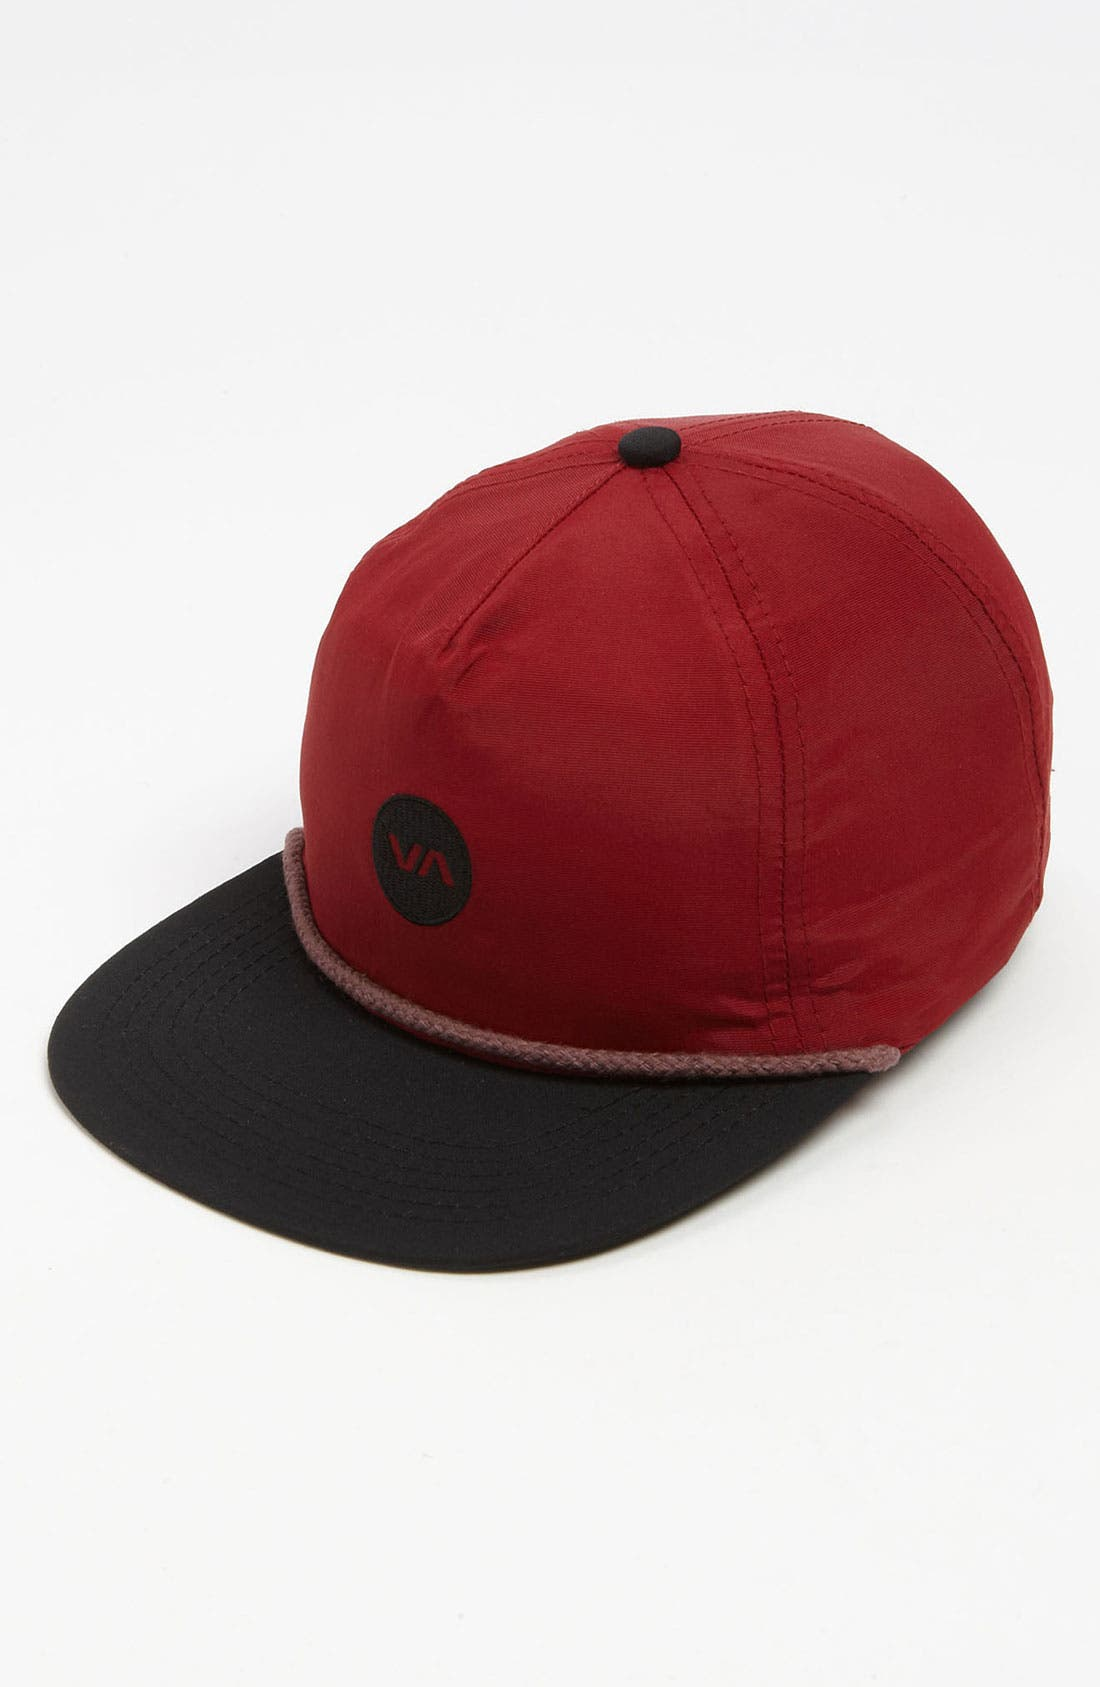 Alternate Image 1 Selected - RVCA 'Dot' Snapback Baseball Cap